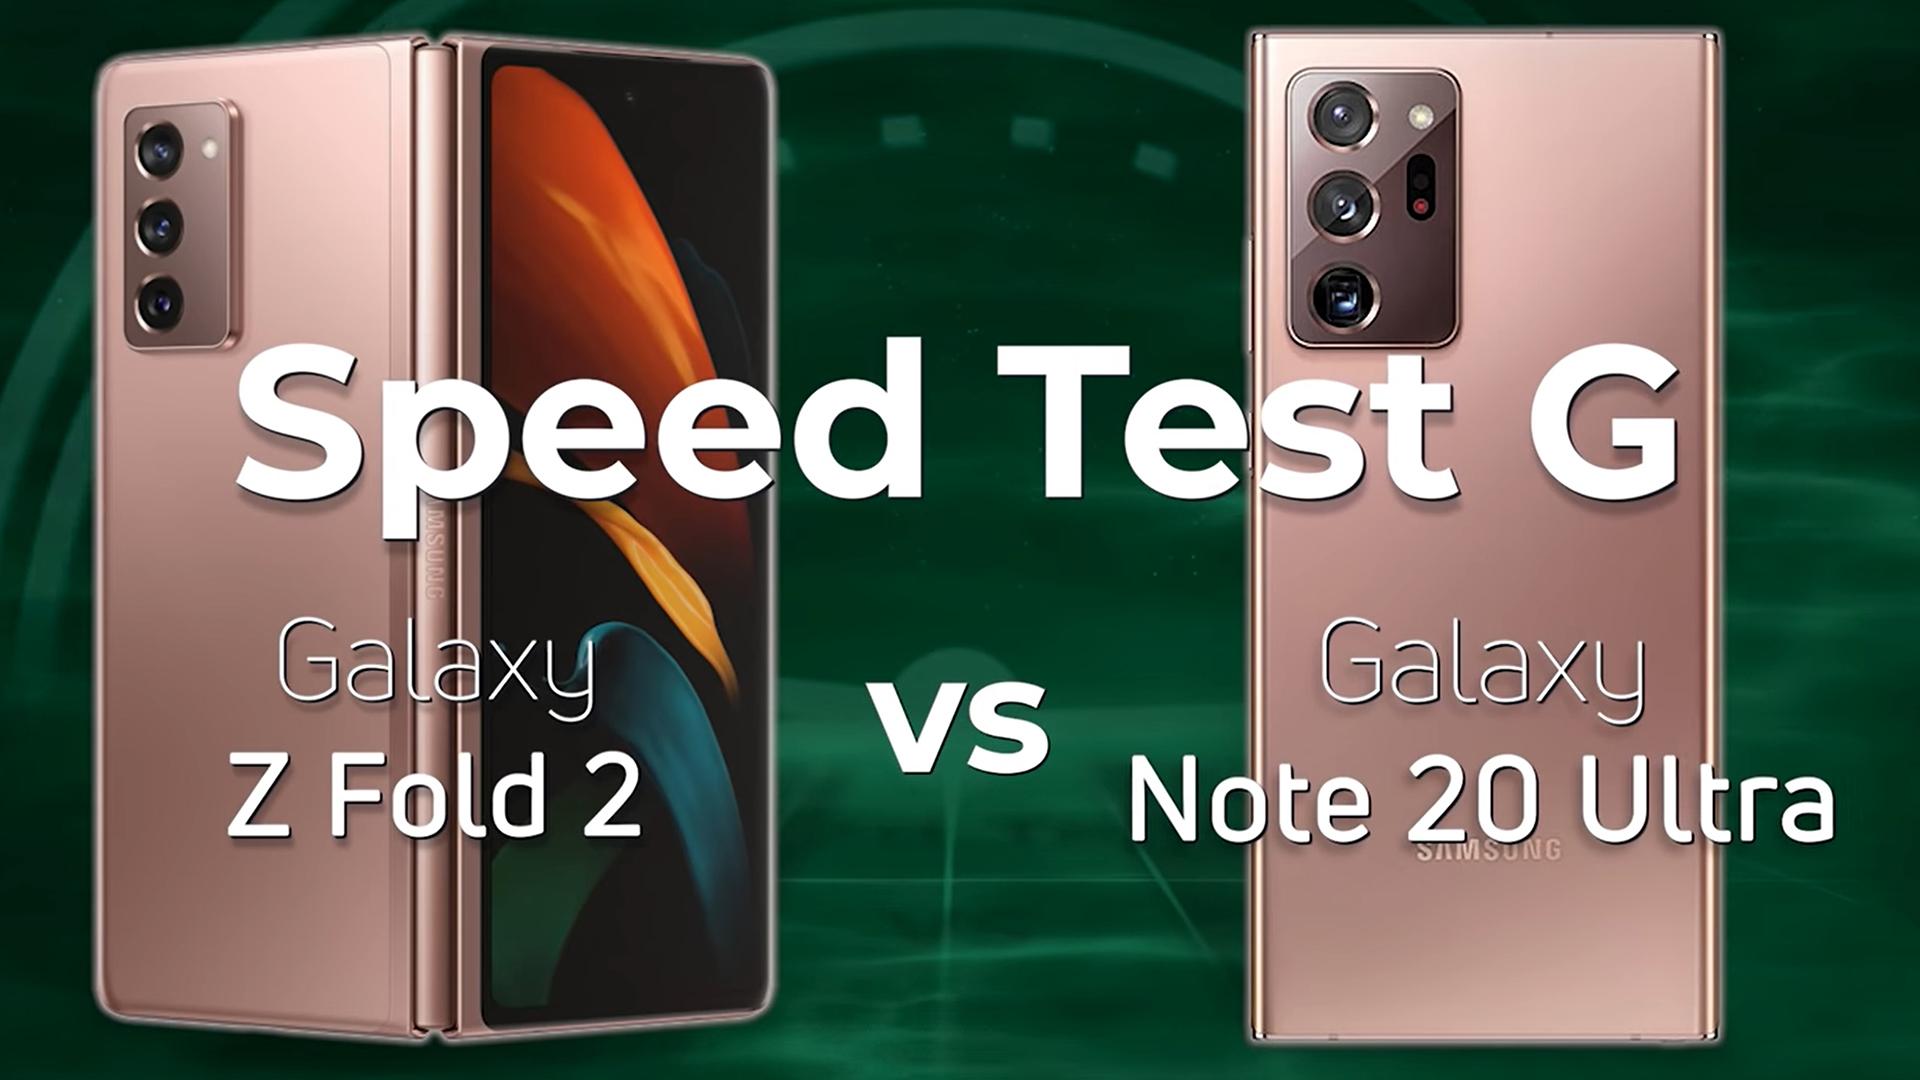 Samsung Galaxy Z Fold 2 vs Samsung Galaxy Note 20 Ultra Speed Test G